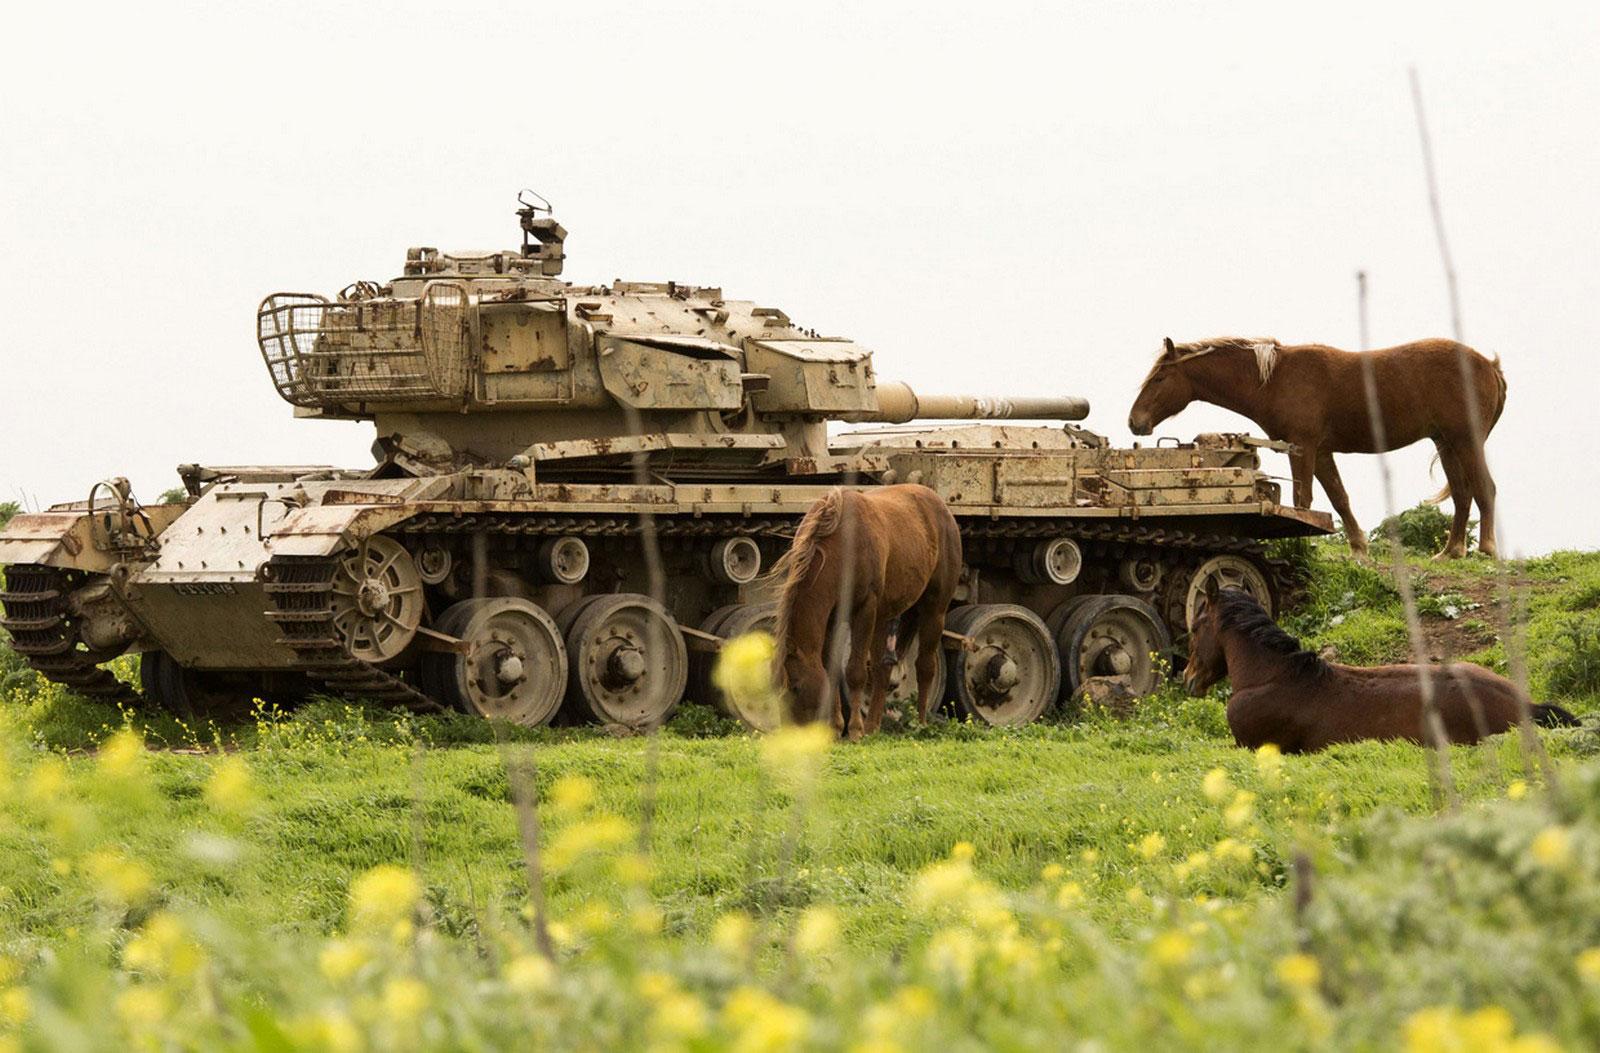 лошади пасутся возле танка, фото